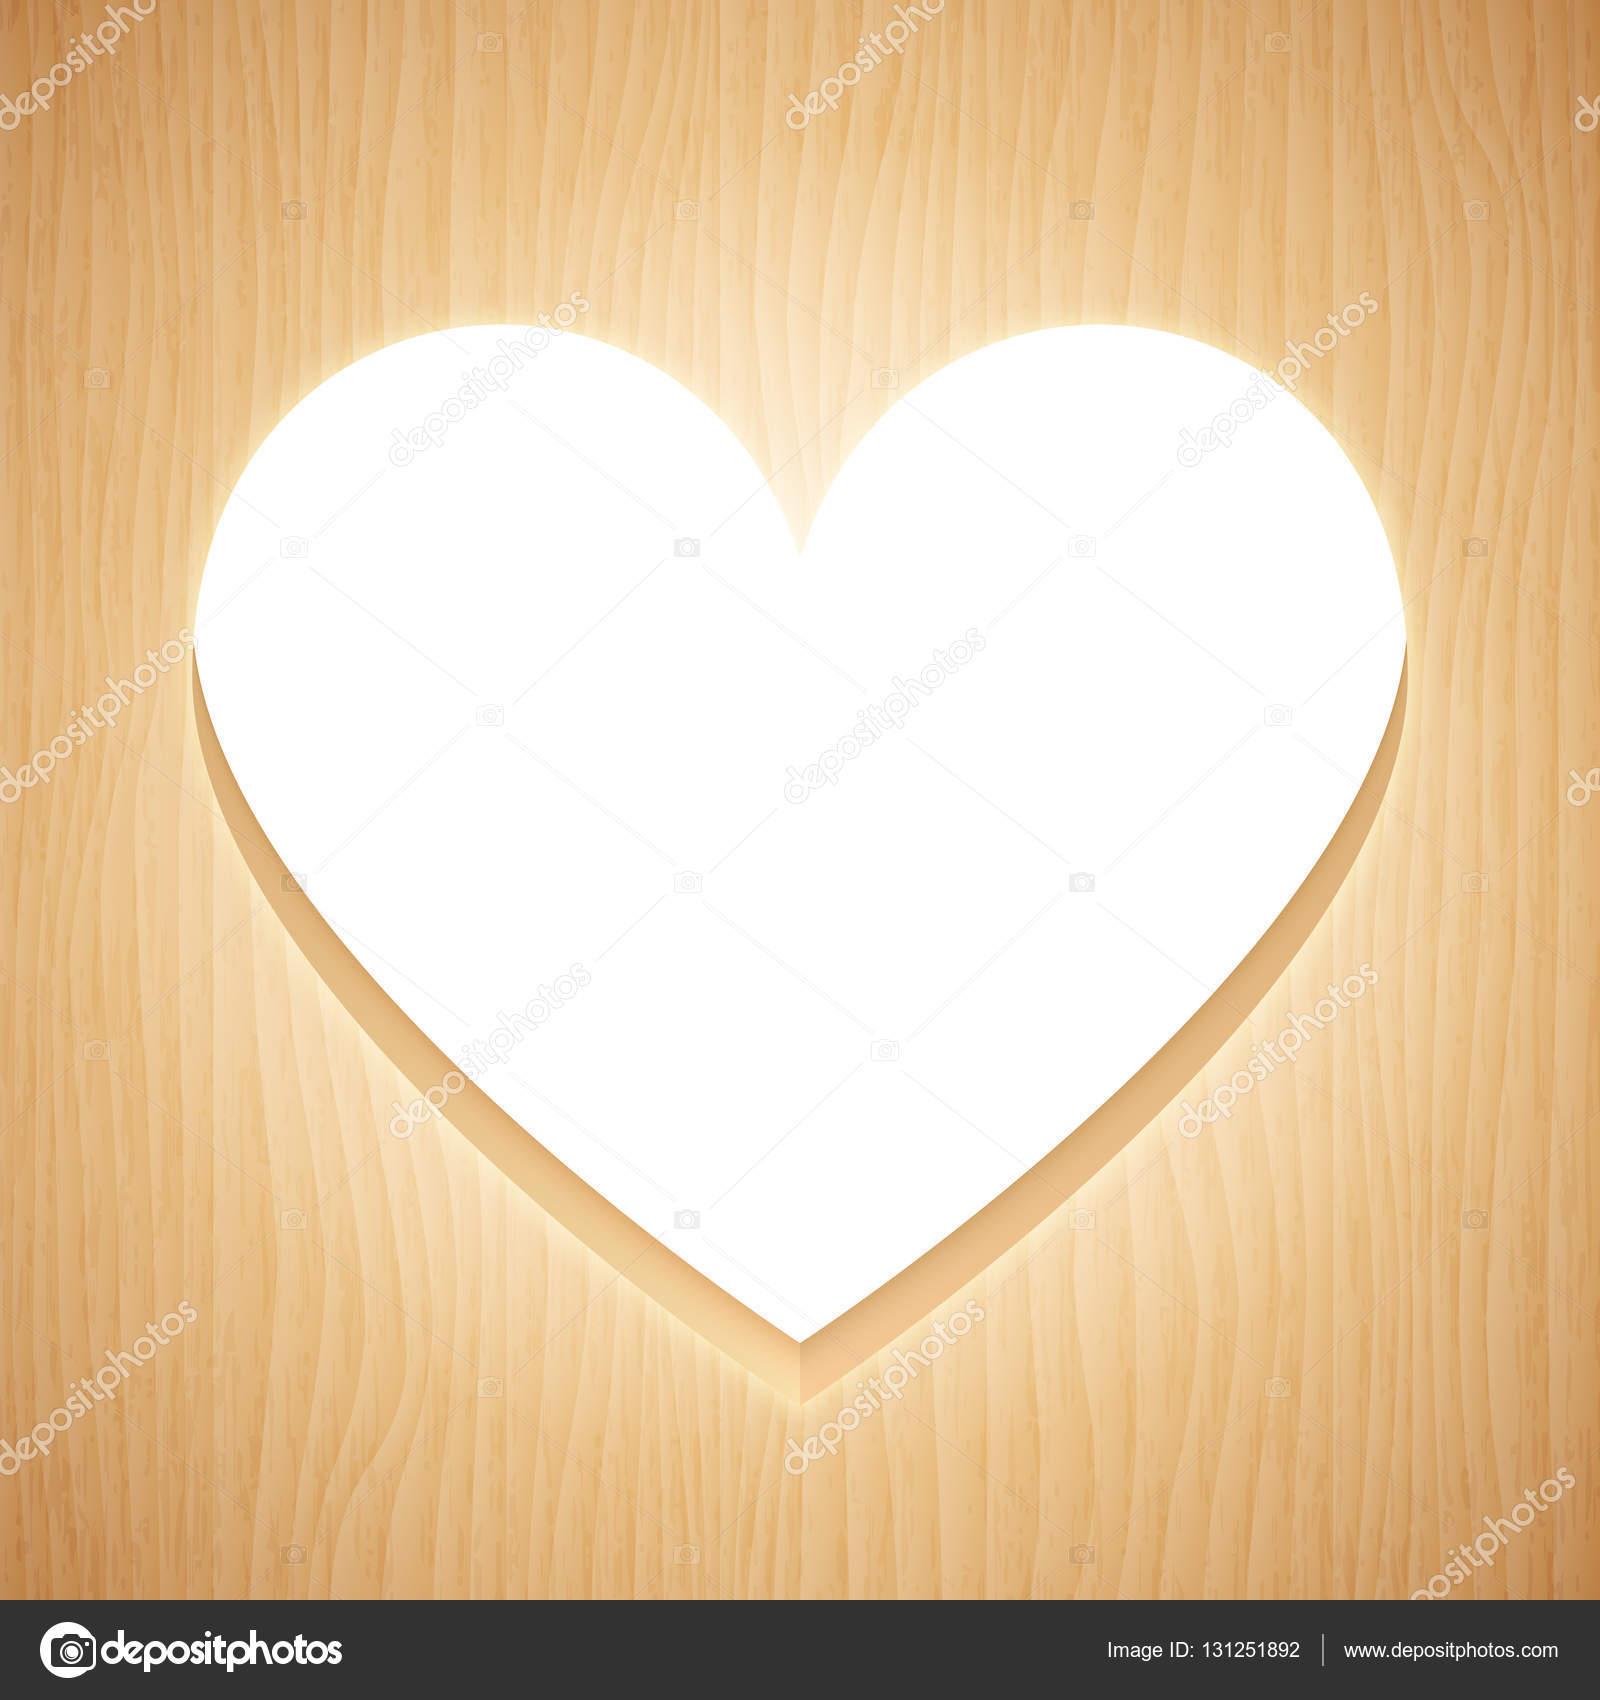 Heart Shaped Wood Frame — Stock Vector © timurock #131251892